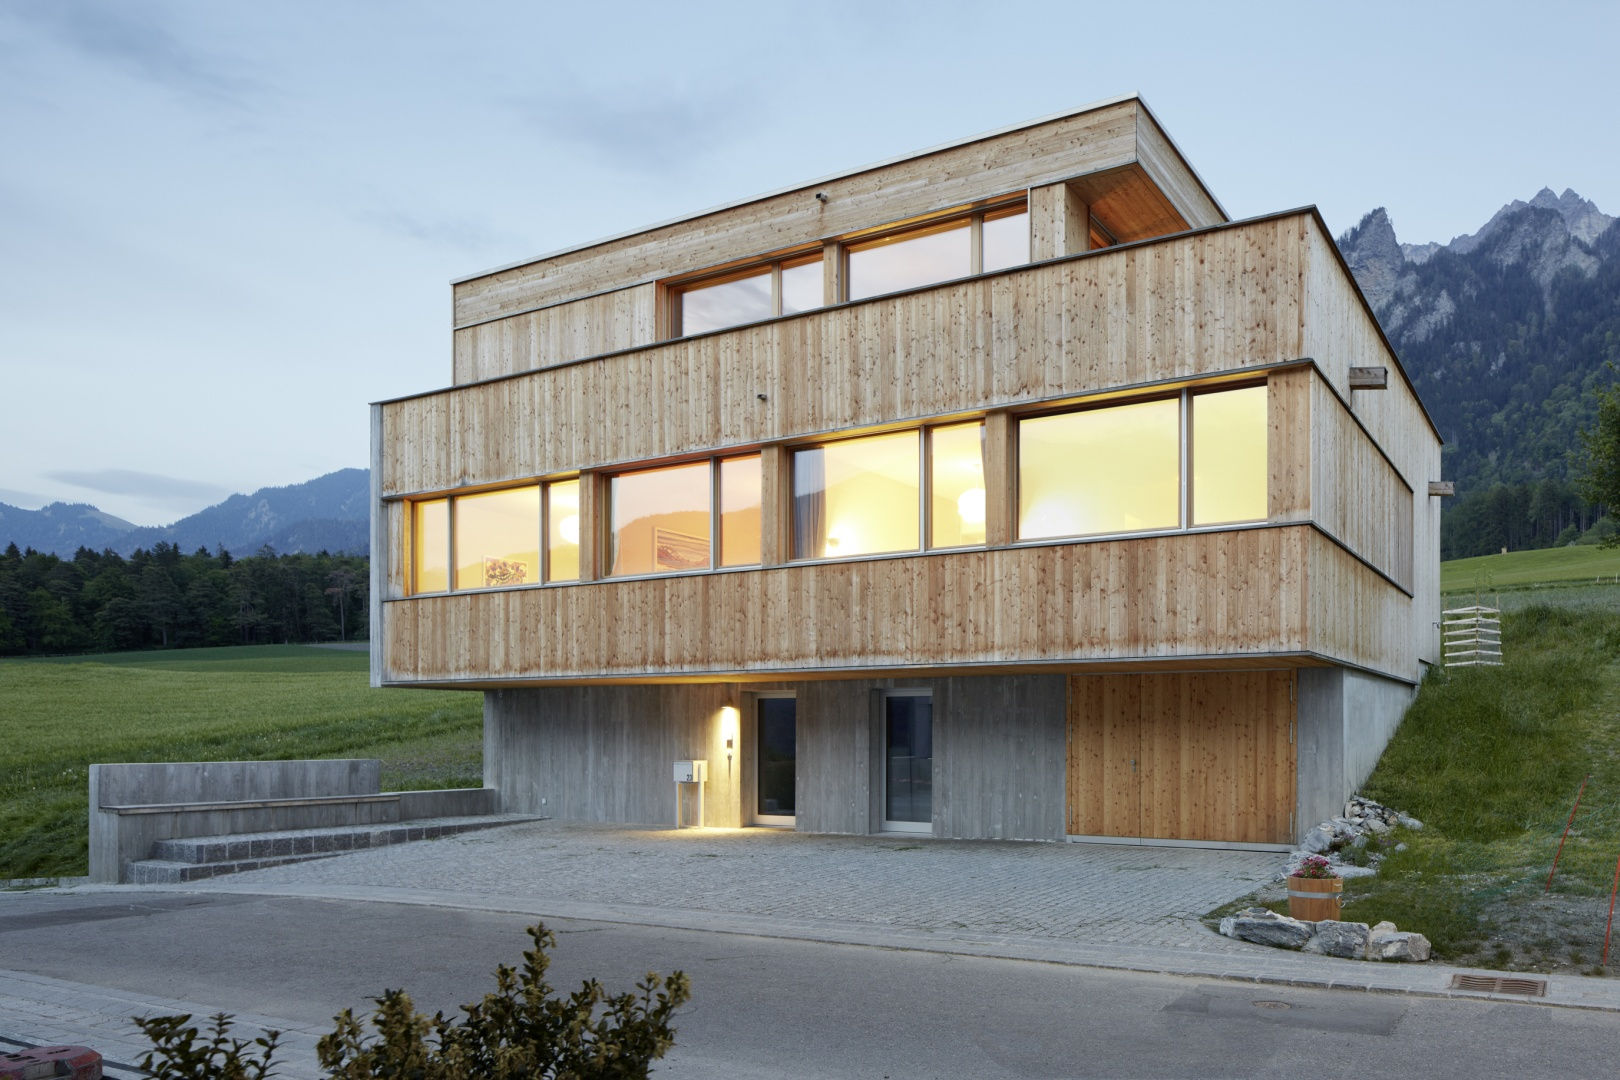 Efh huwiler maranta arc award - Architekten deutschland ...